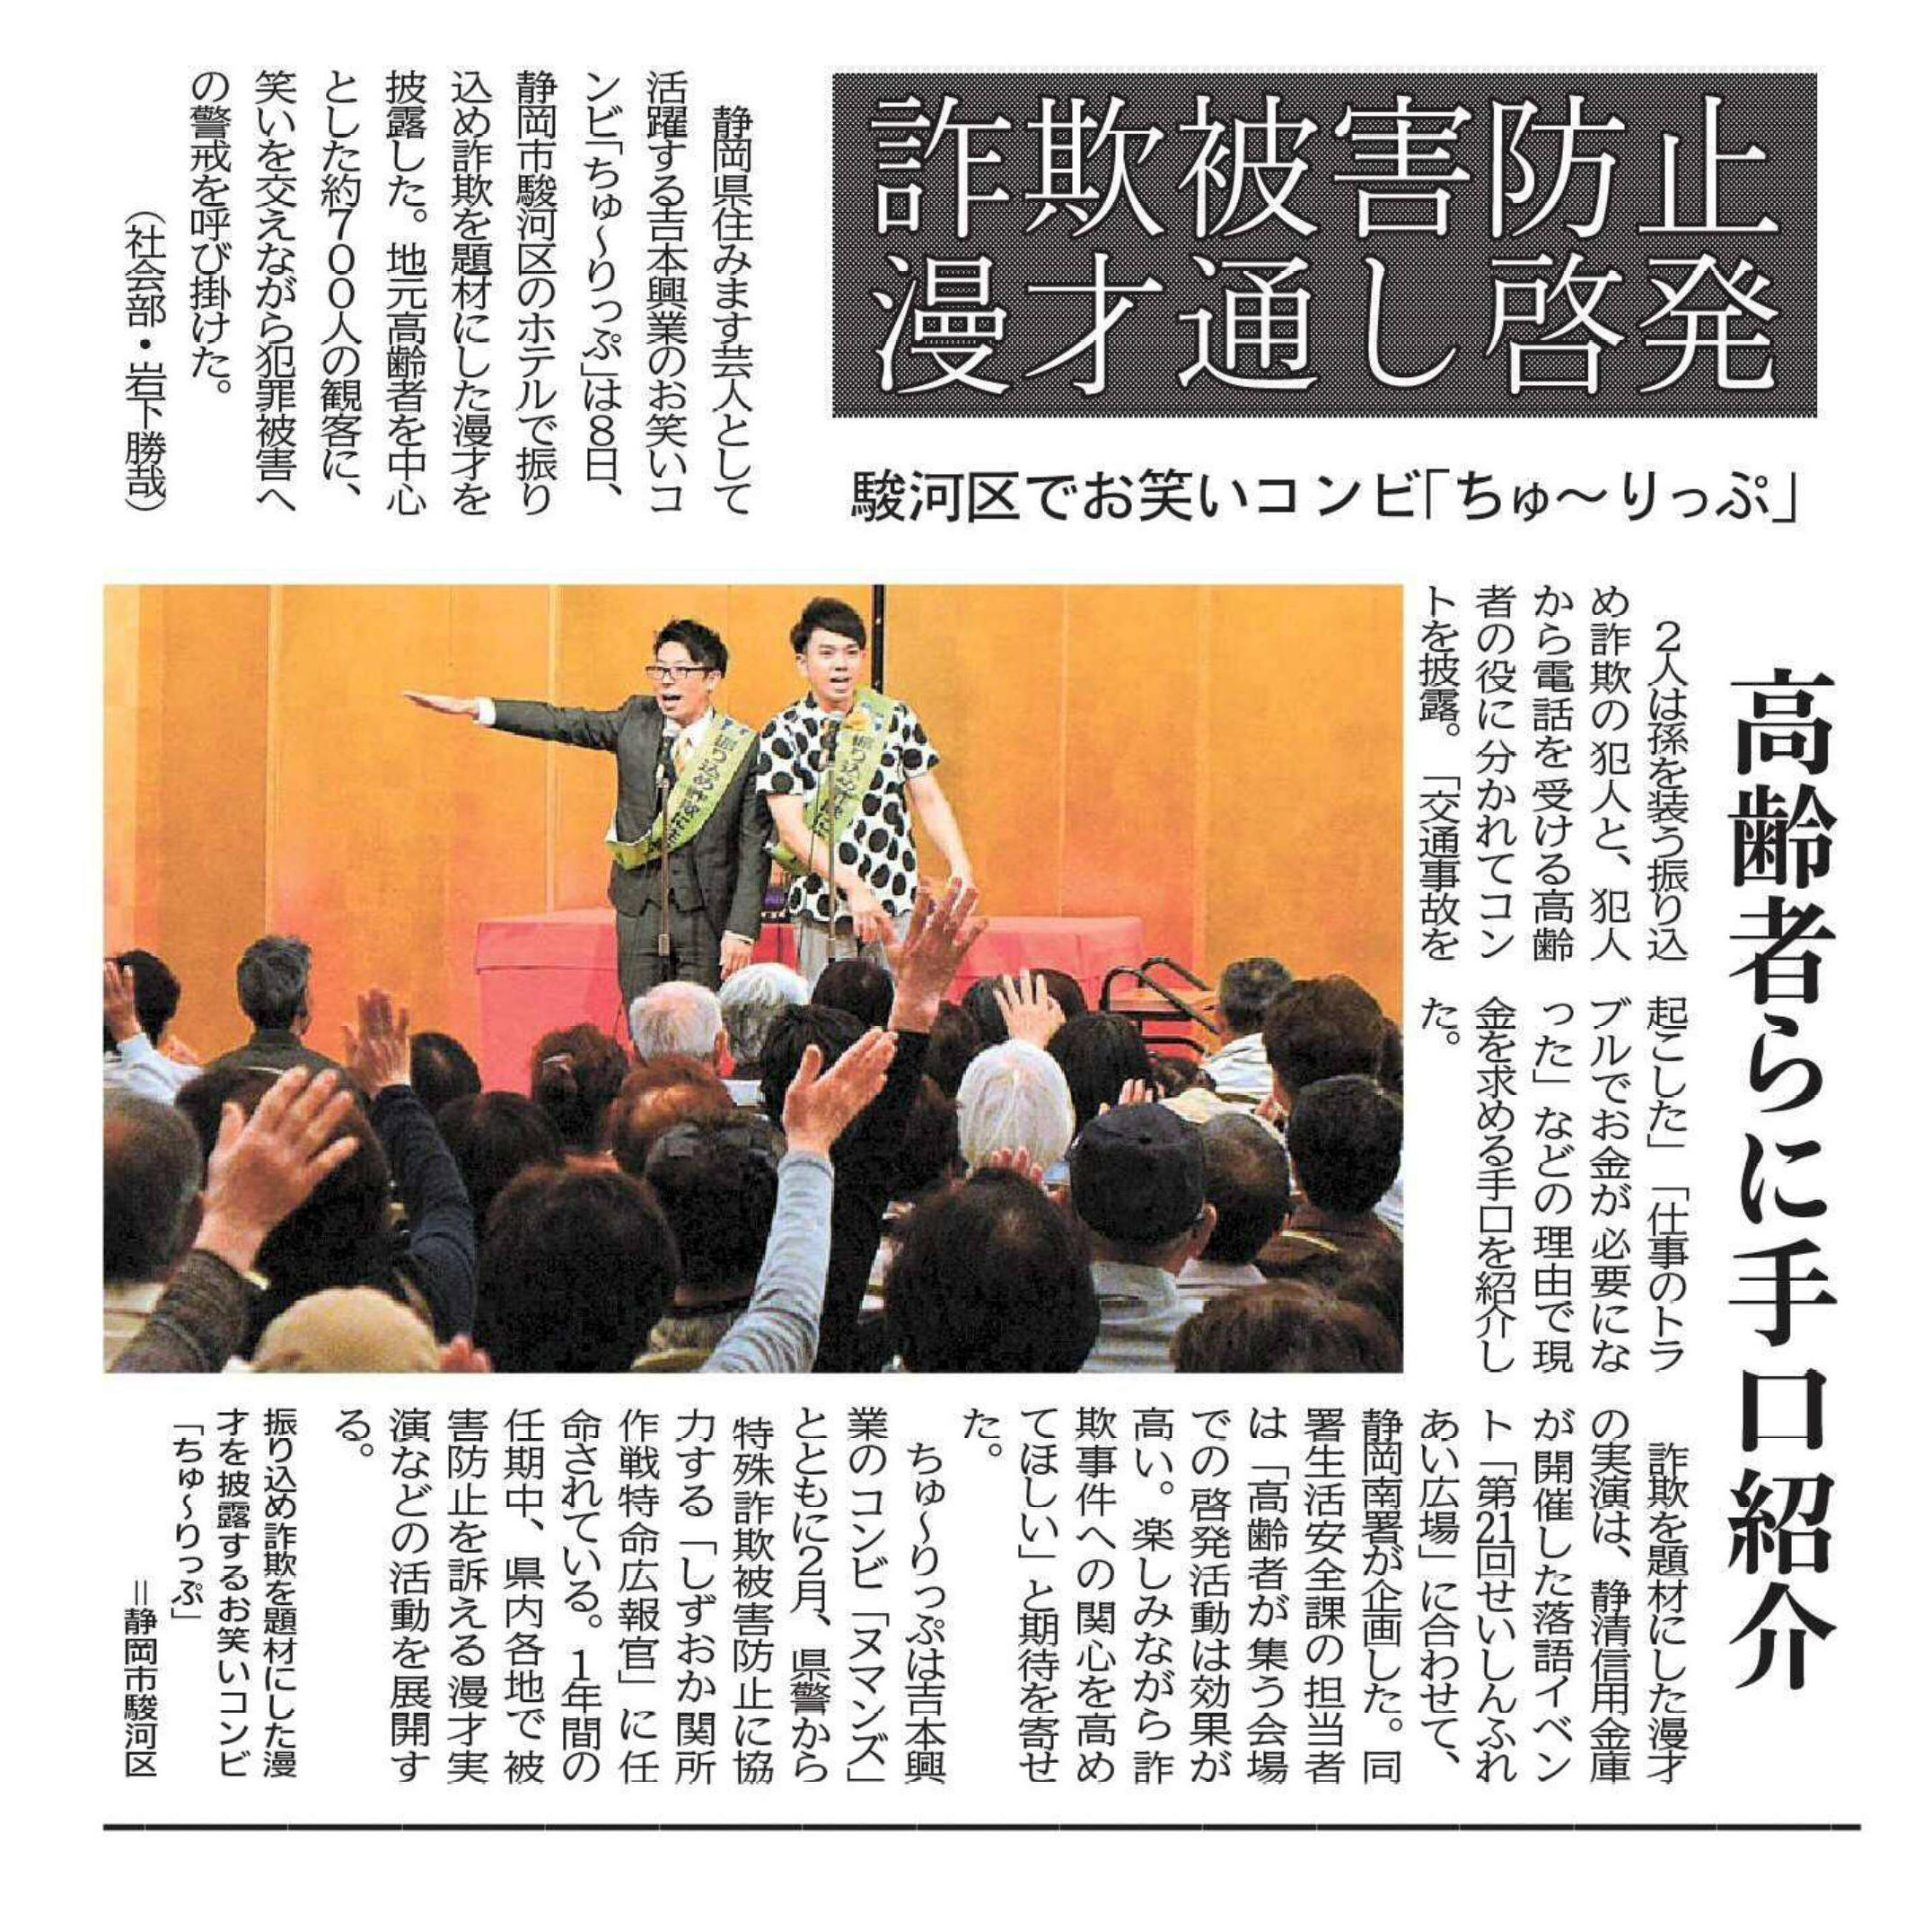 http://47web.jp/shizuoka/uploads/62c3af601cbc772e566853d388afbd9e8765c3fb.jpg